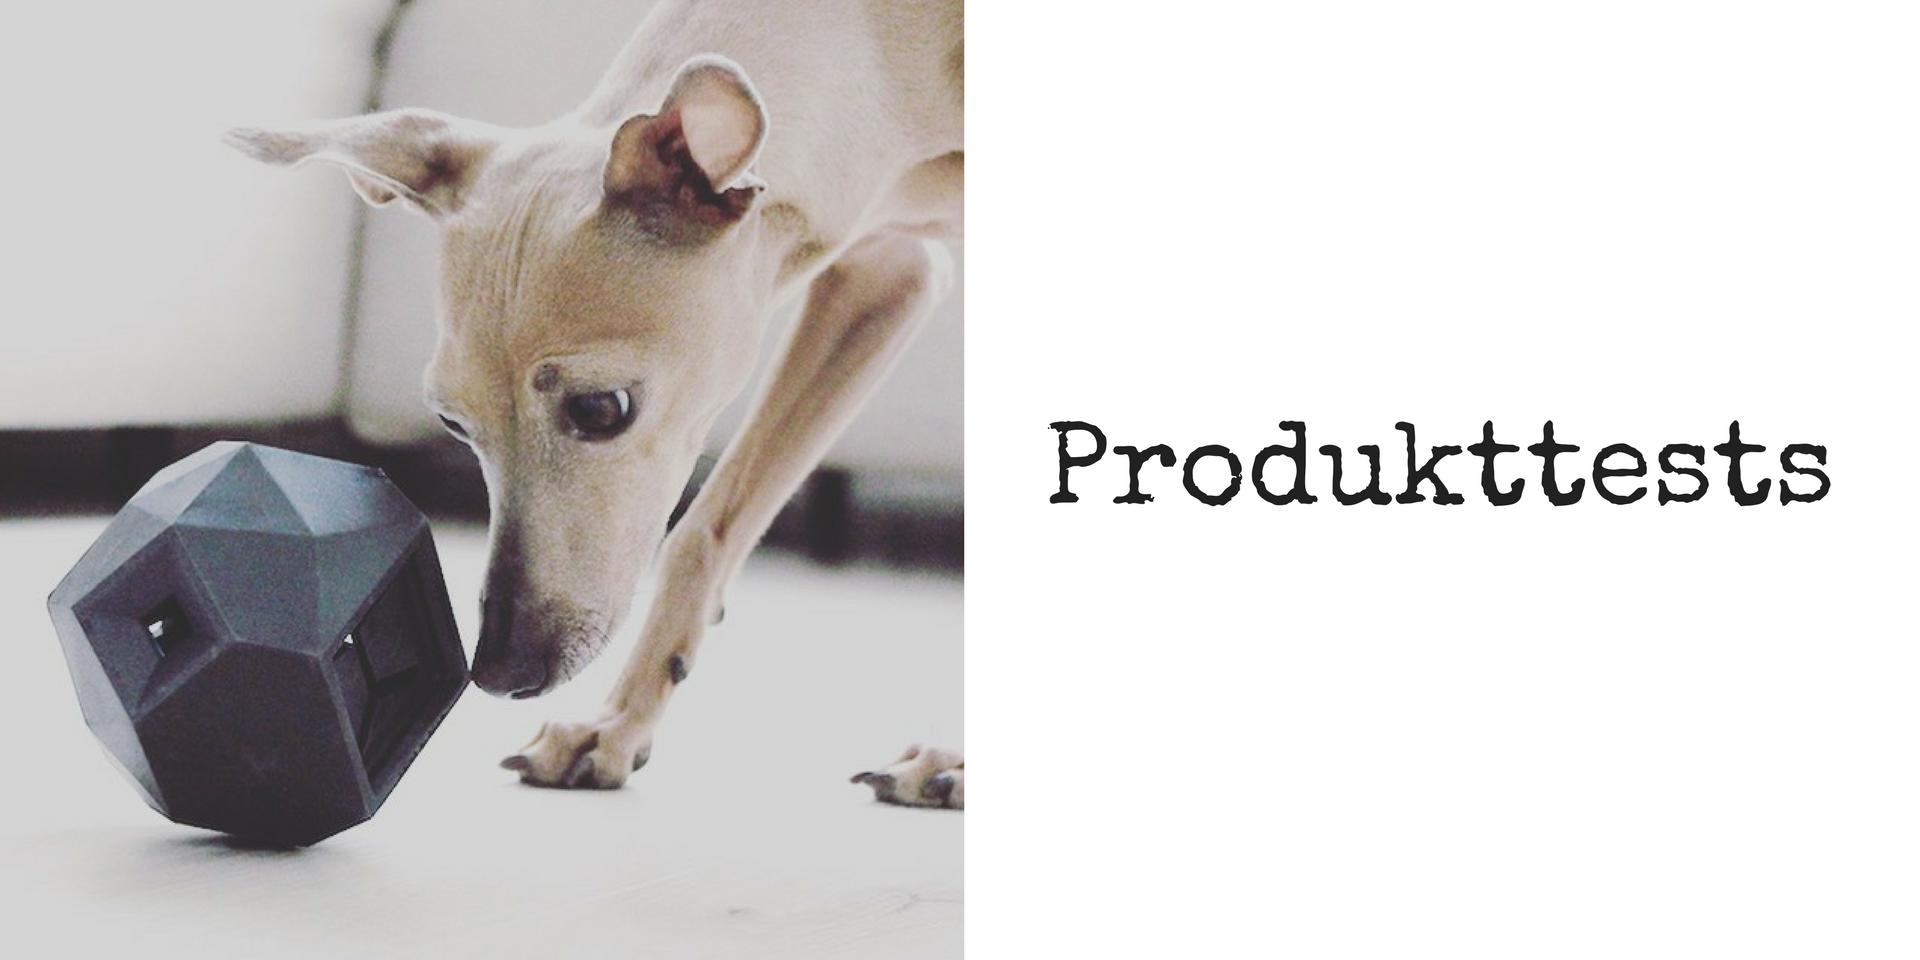 miDoggy Blog Community für Hunde Produkttest